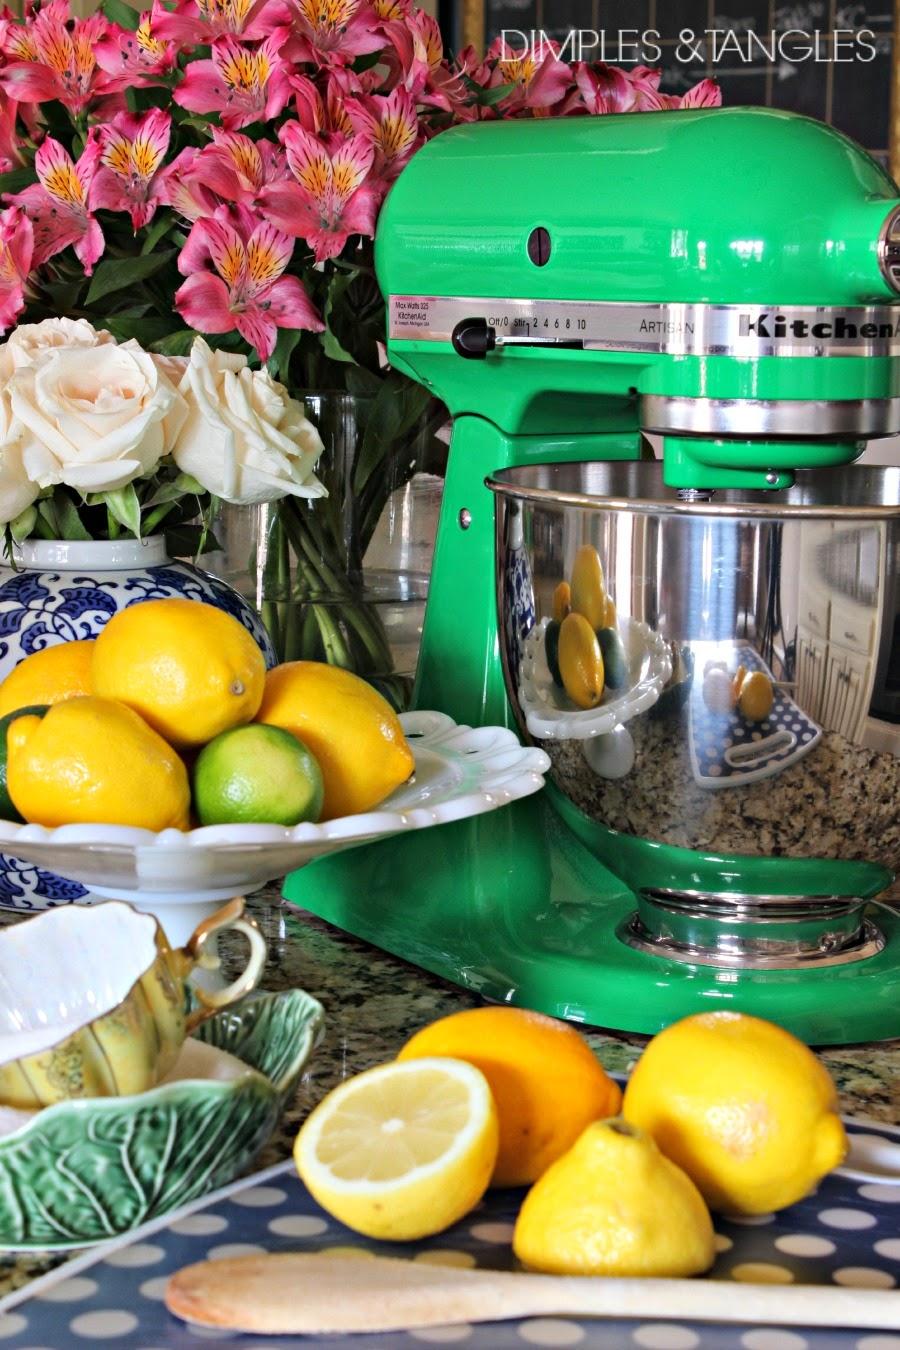 Green kitchenaid stand mixer - Kitchenaid Stand Mixer Green My New Mixer Made The Best Lemon Squares Ever I Ll